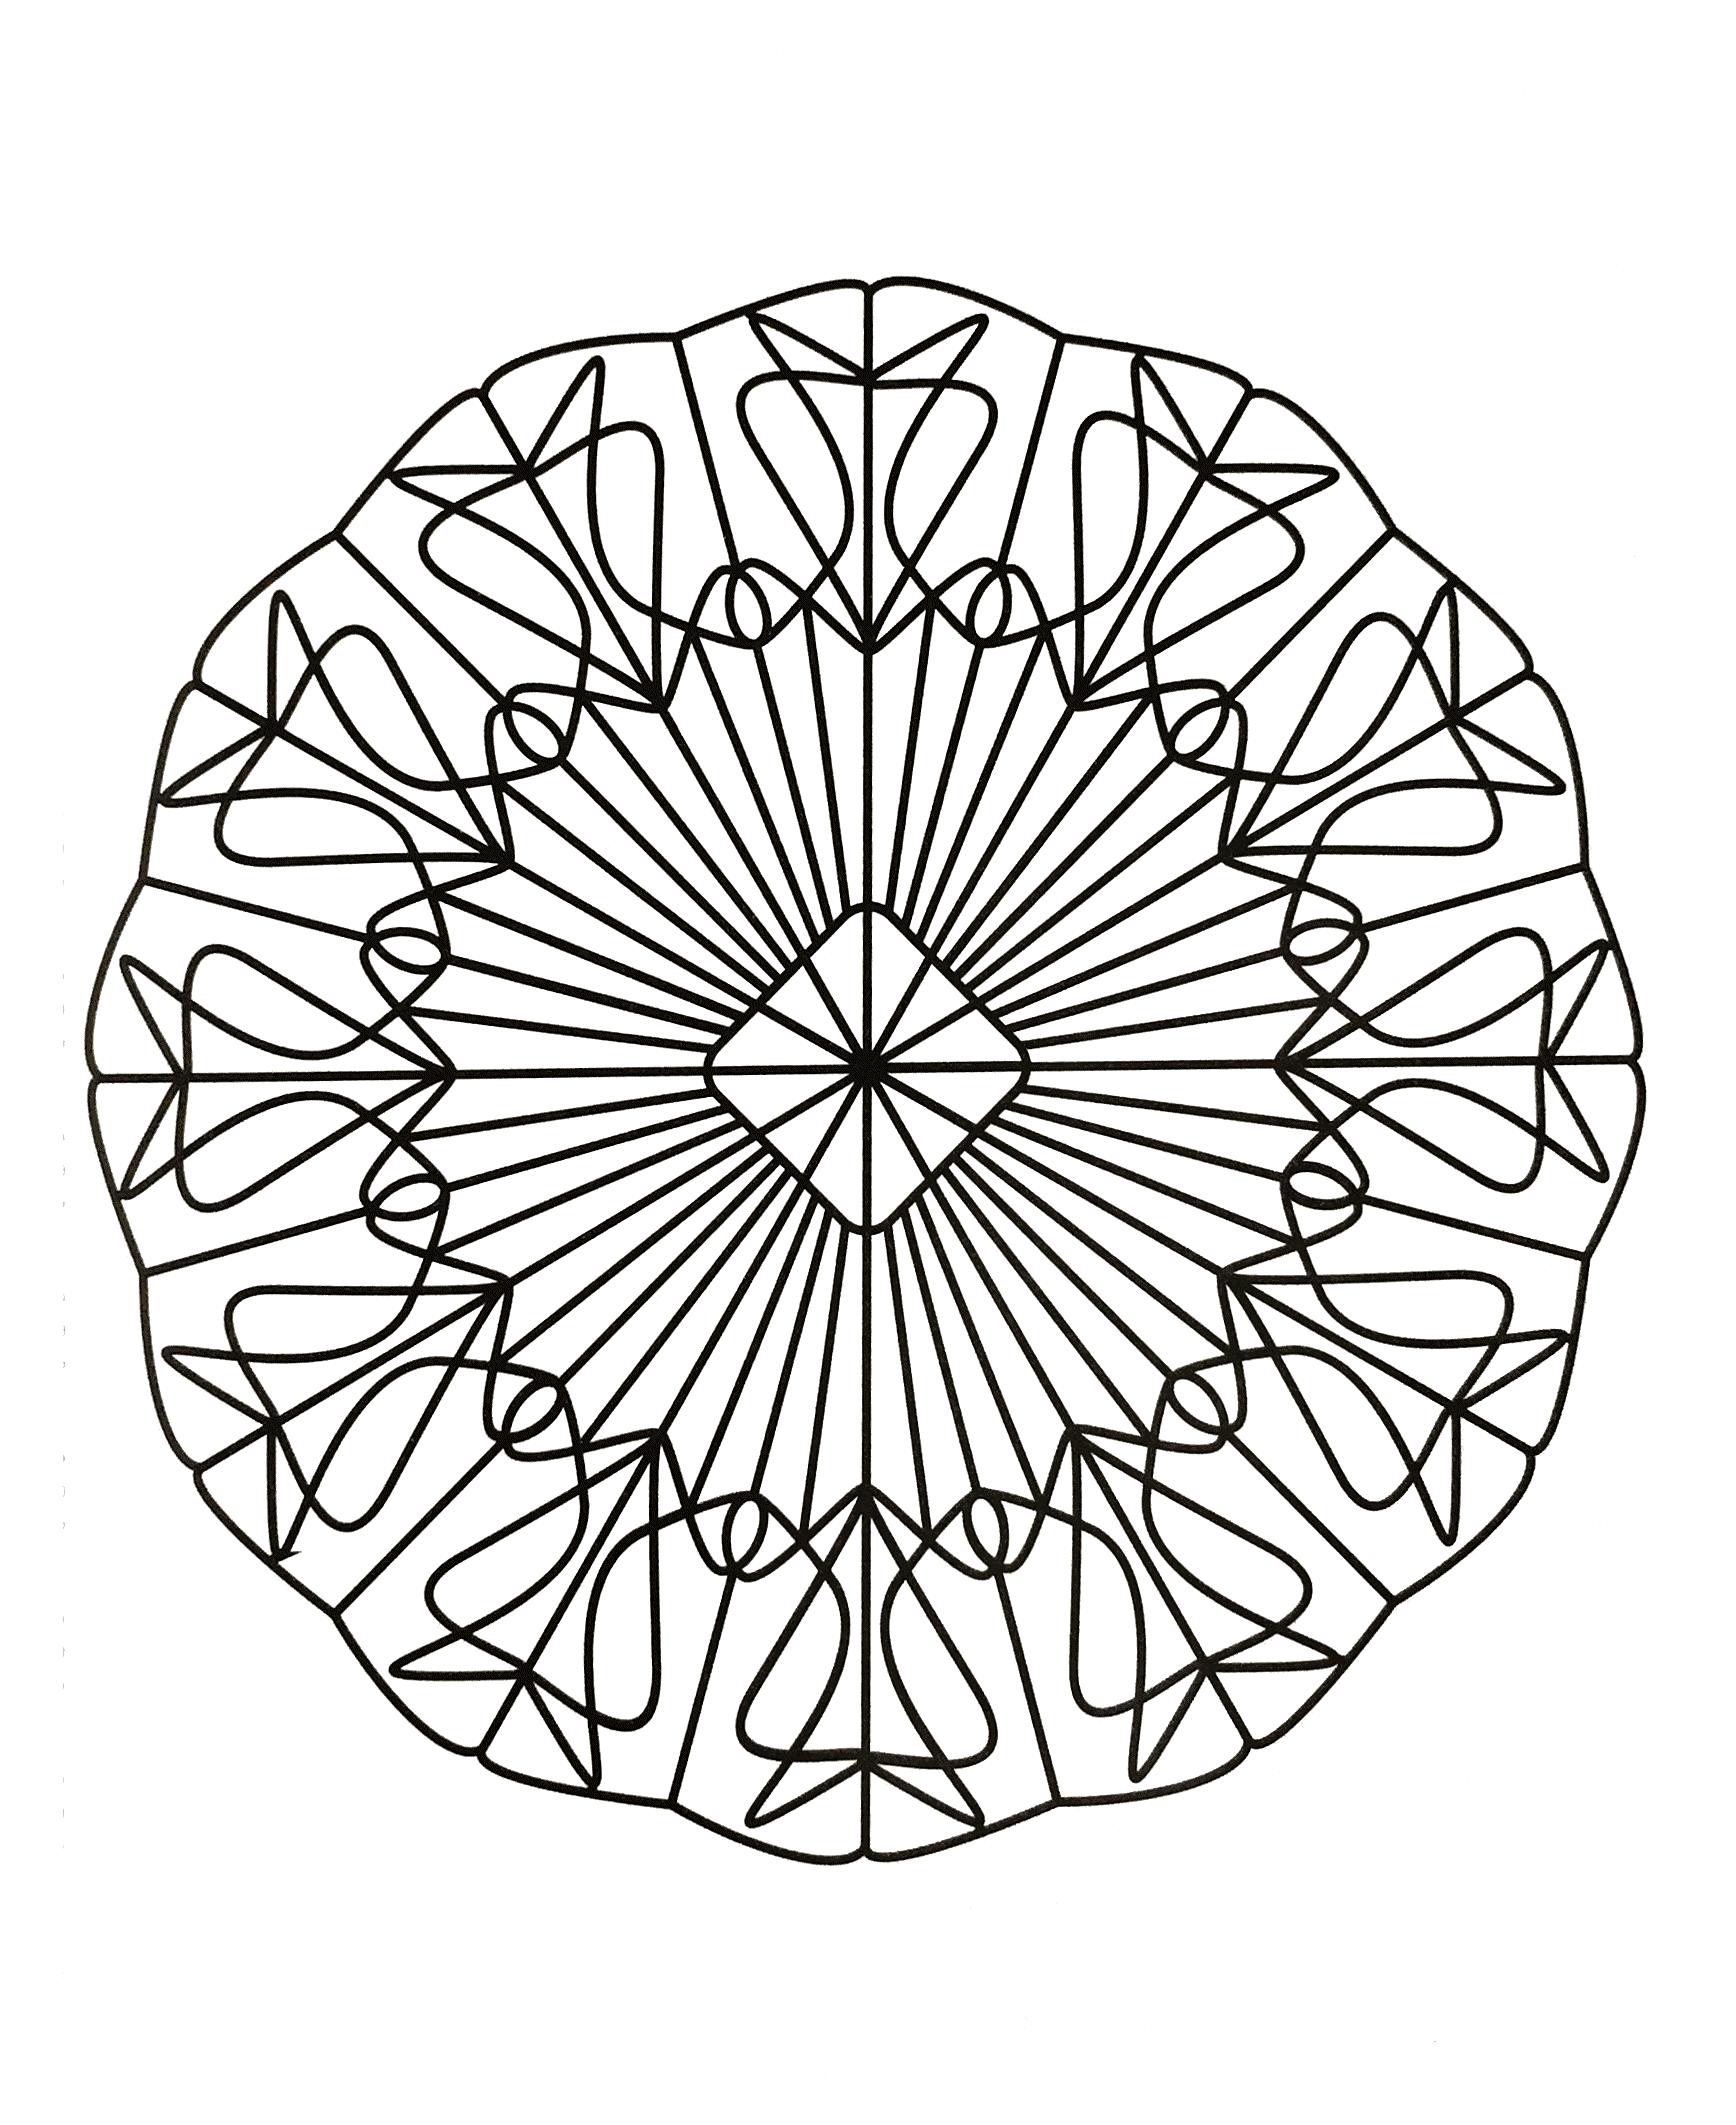 Simple mandala 46 - Mandalas Coloring pages for kids to ...